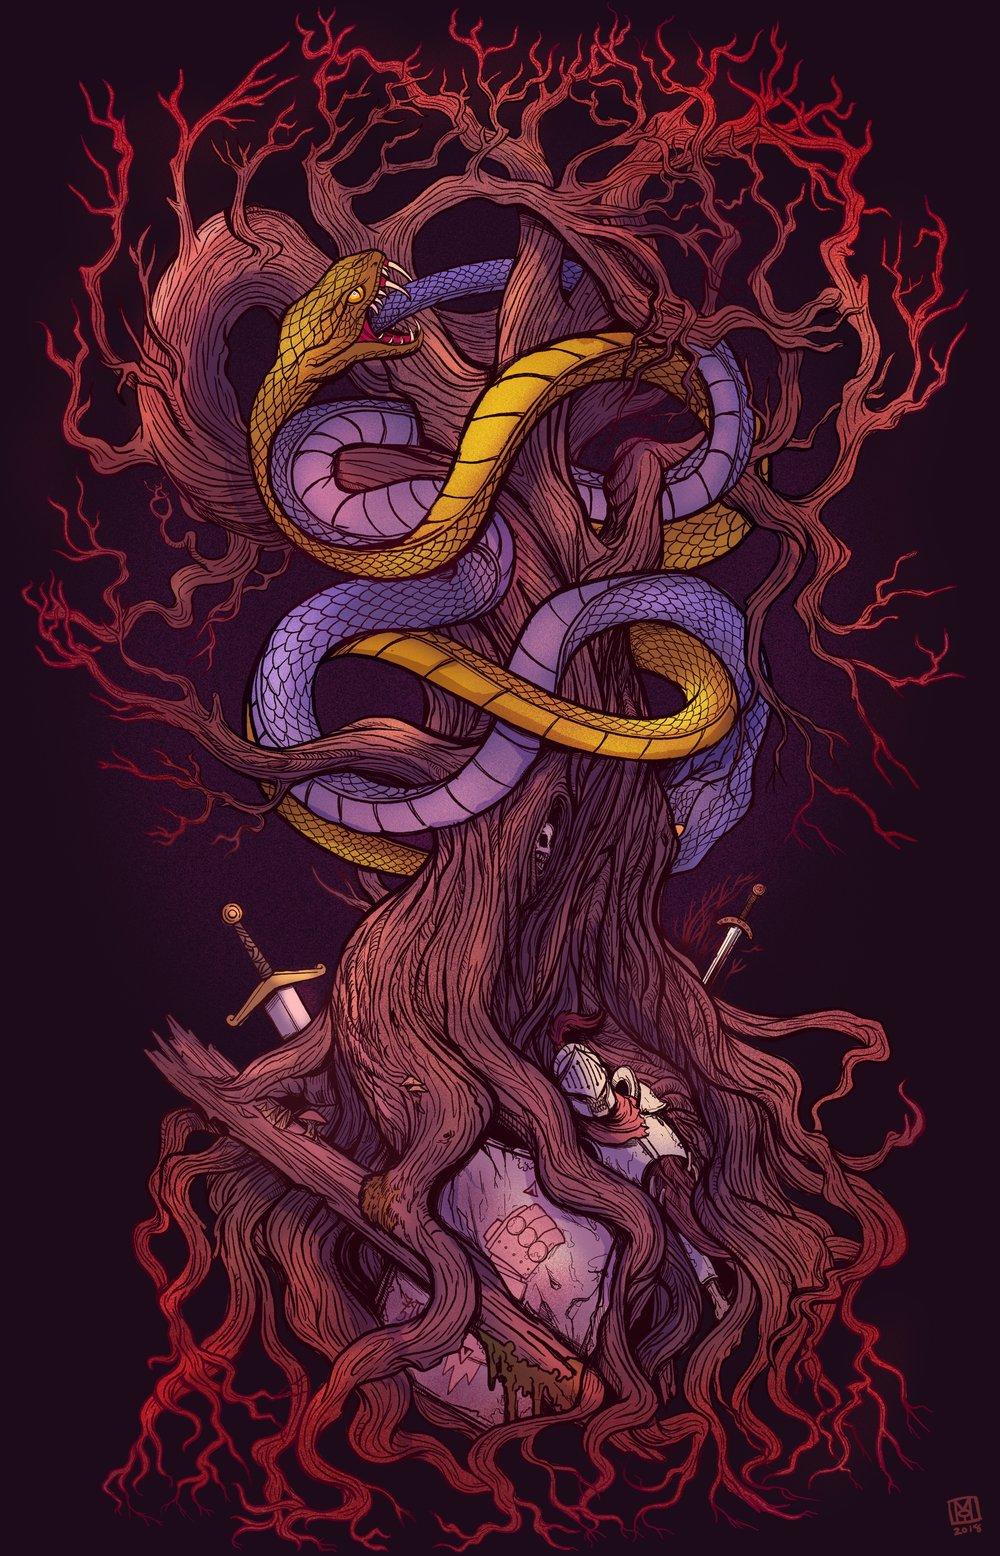 Bloodtree